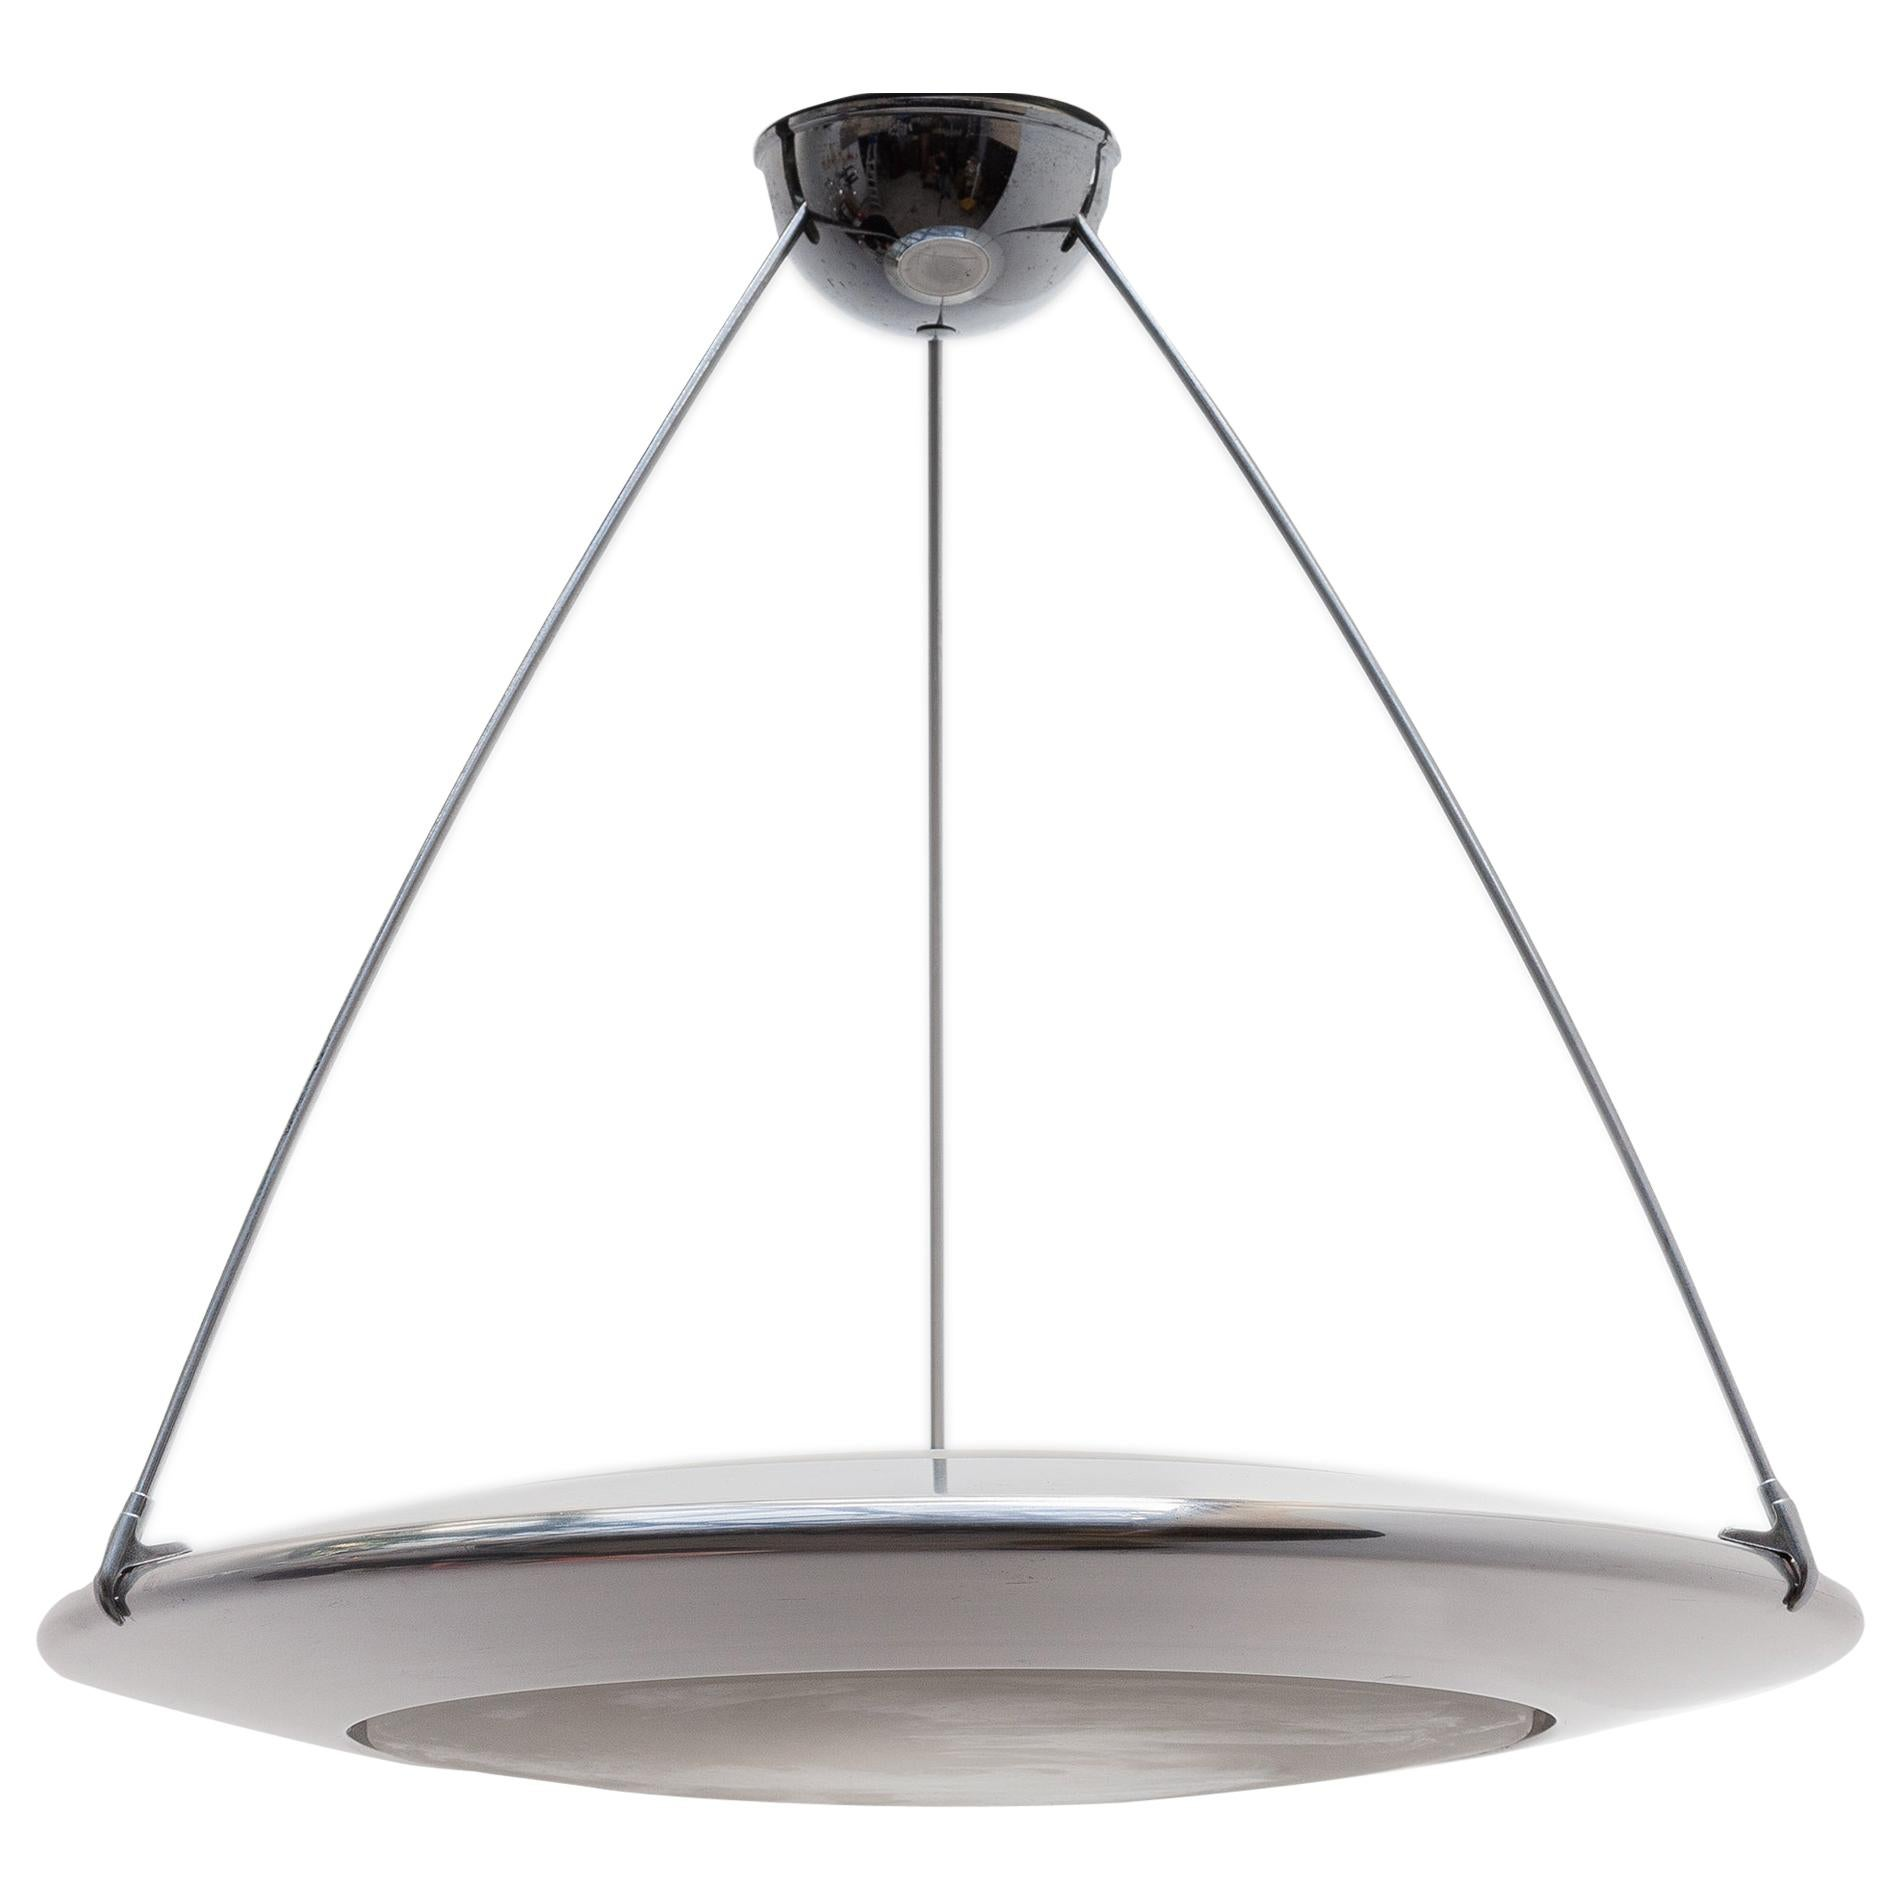 "Arteluce Atomic Space Chrome Disk Lamp Mira ""C"" Designed by Ezio Didone"